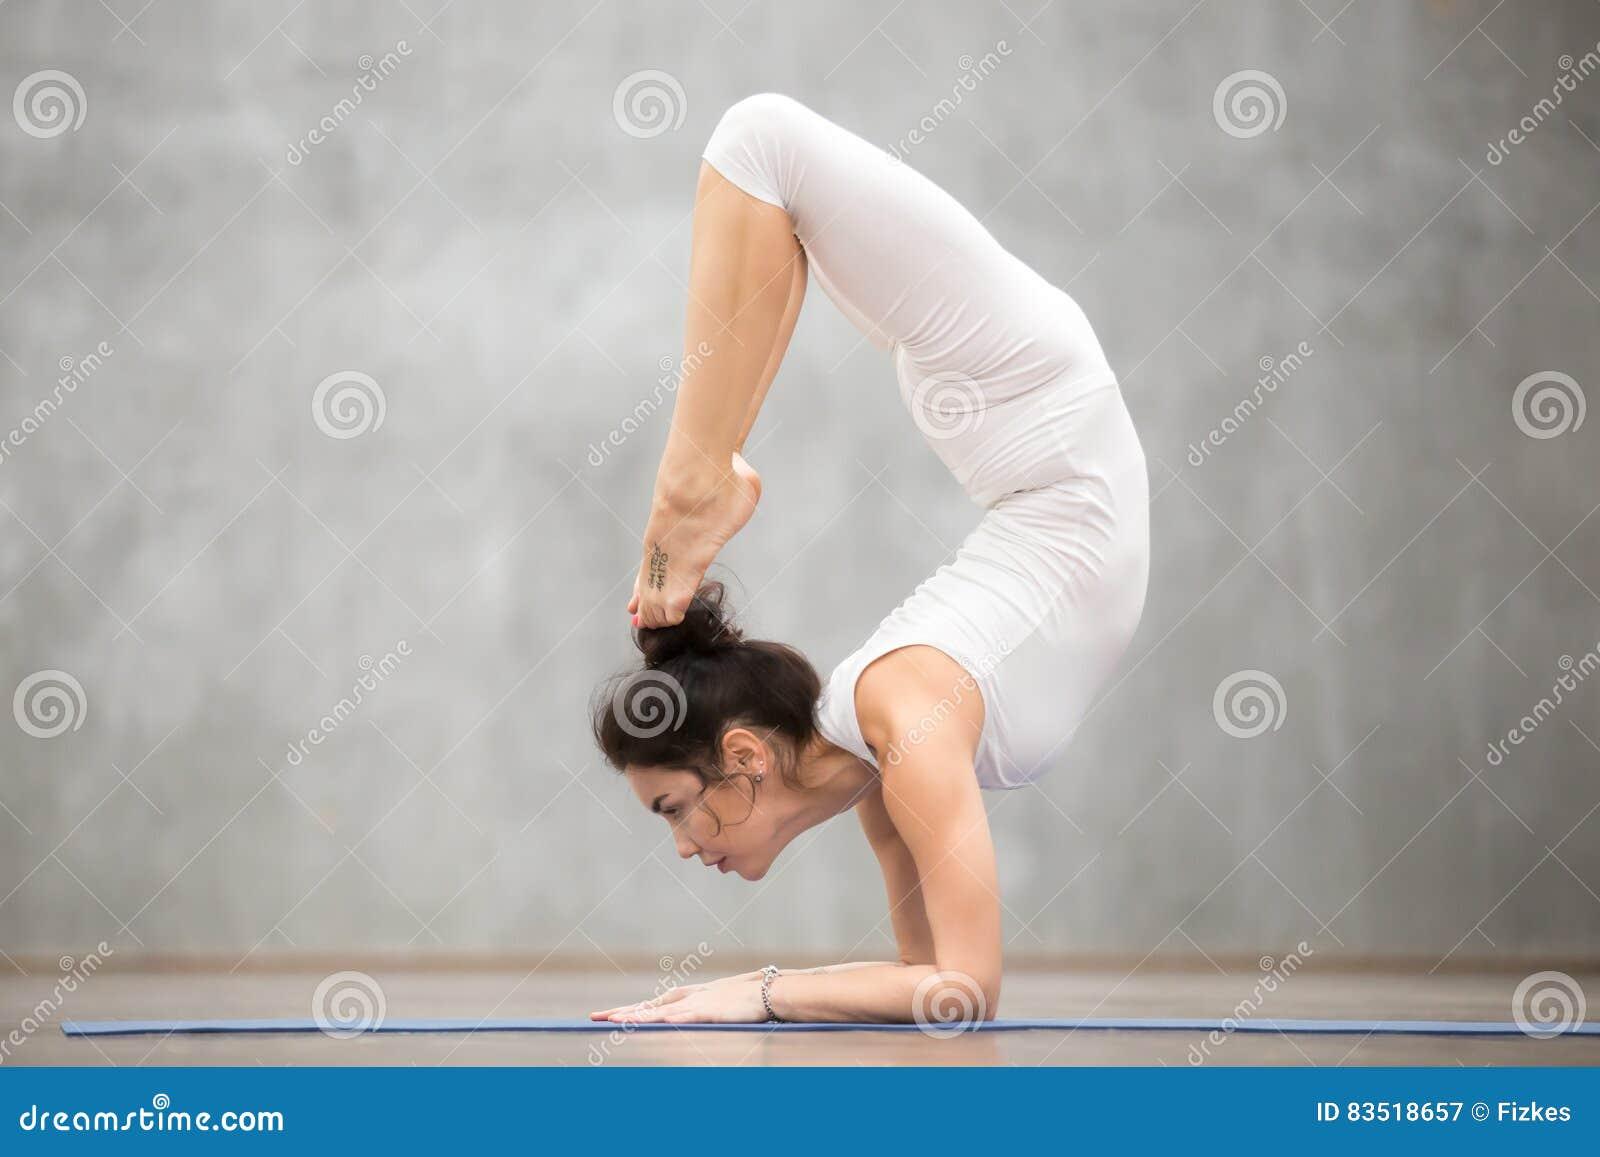 f7f31a8ab62e0 Beautiful Yoga: Scorpion Pose Stock Image - Image of dancer, indoors ...